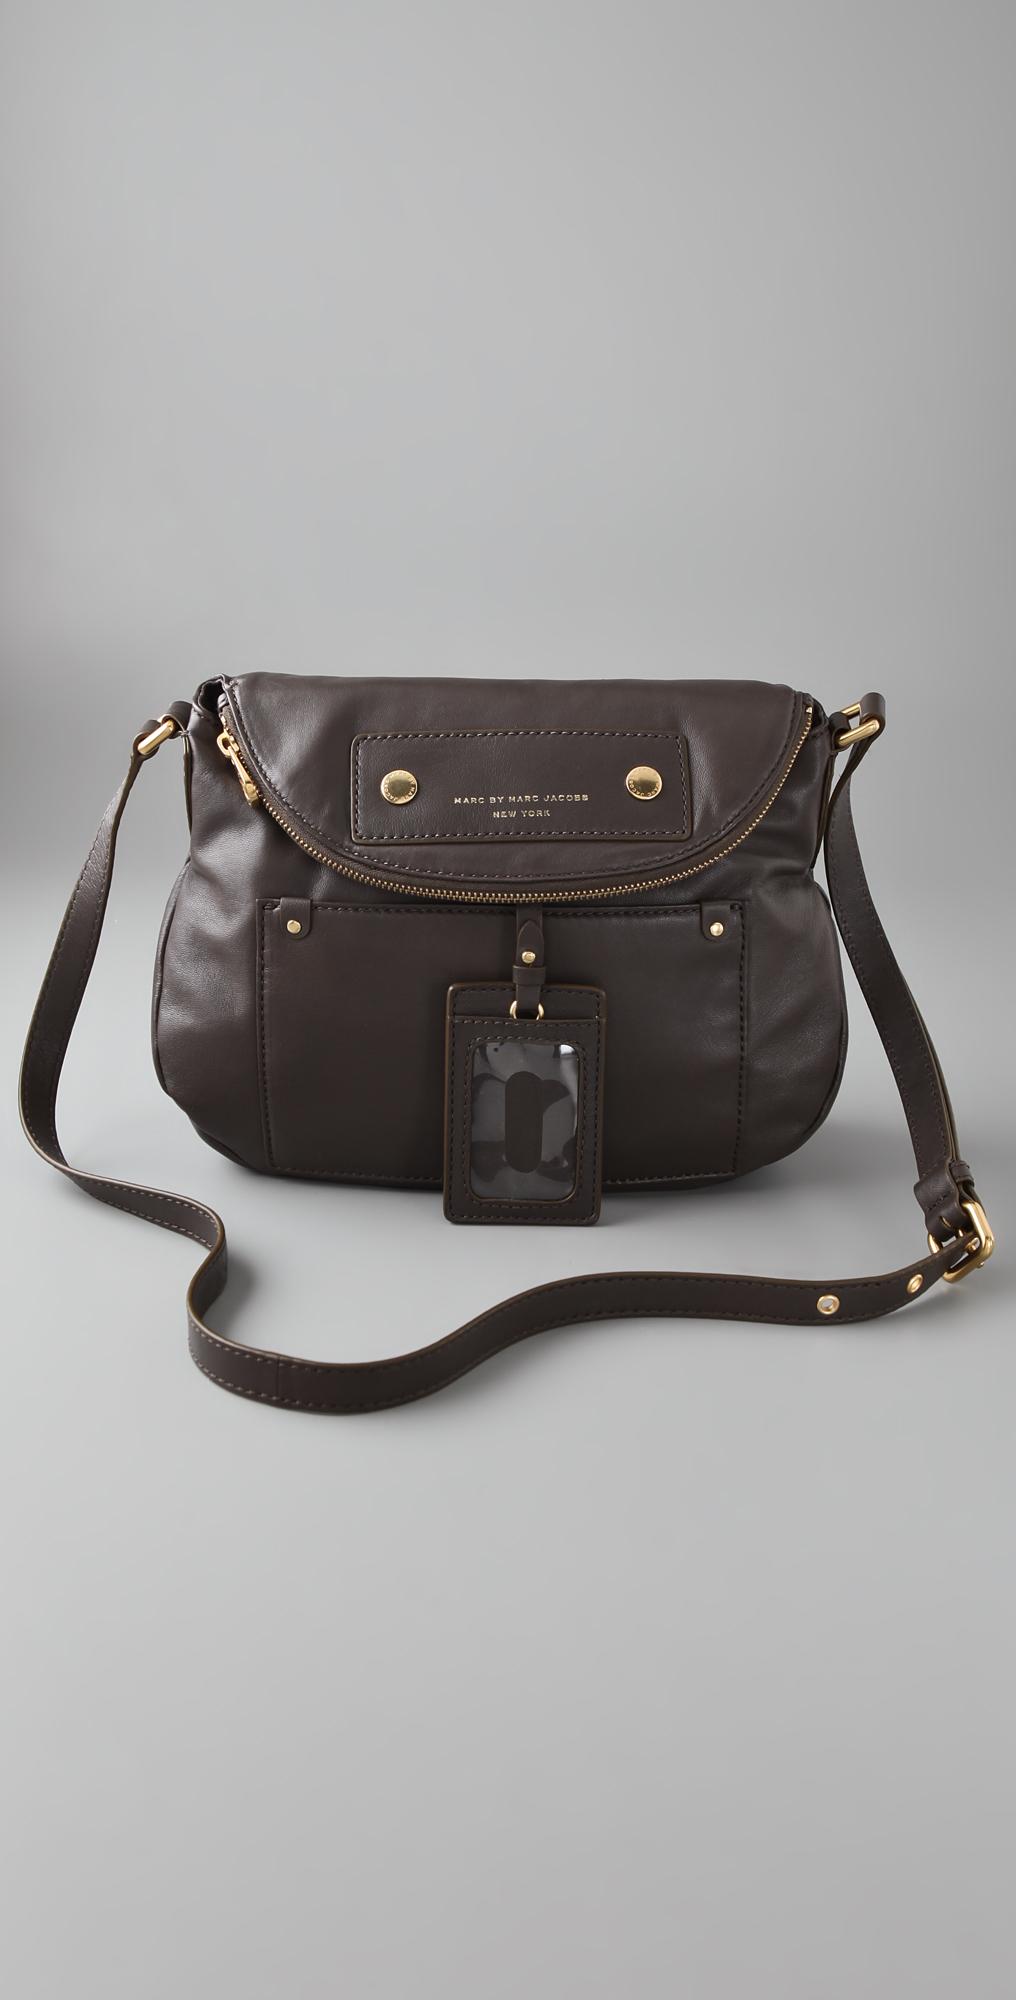 18b5fd173a3f Marc by Marc Jacobs Preppy Leather Natasha Messenger Bag